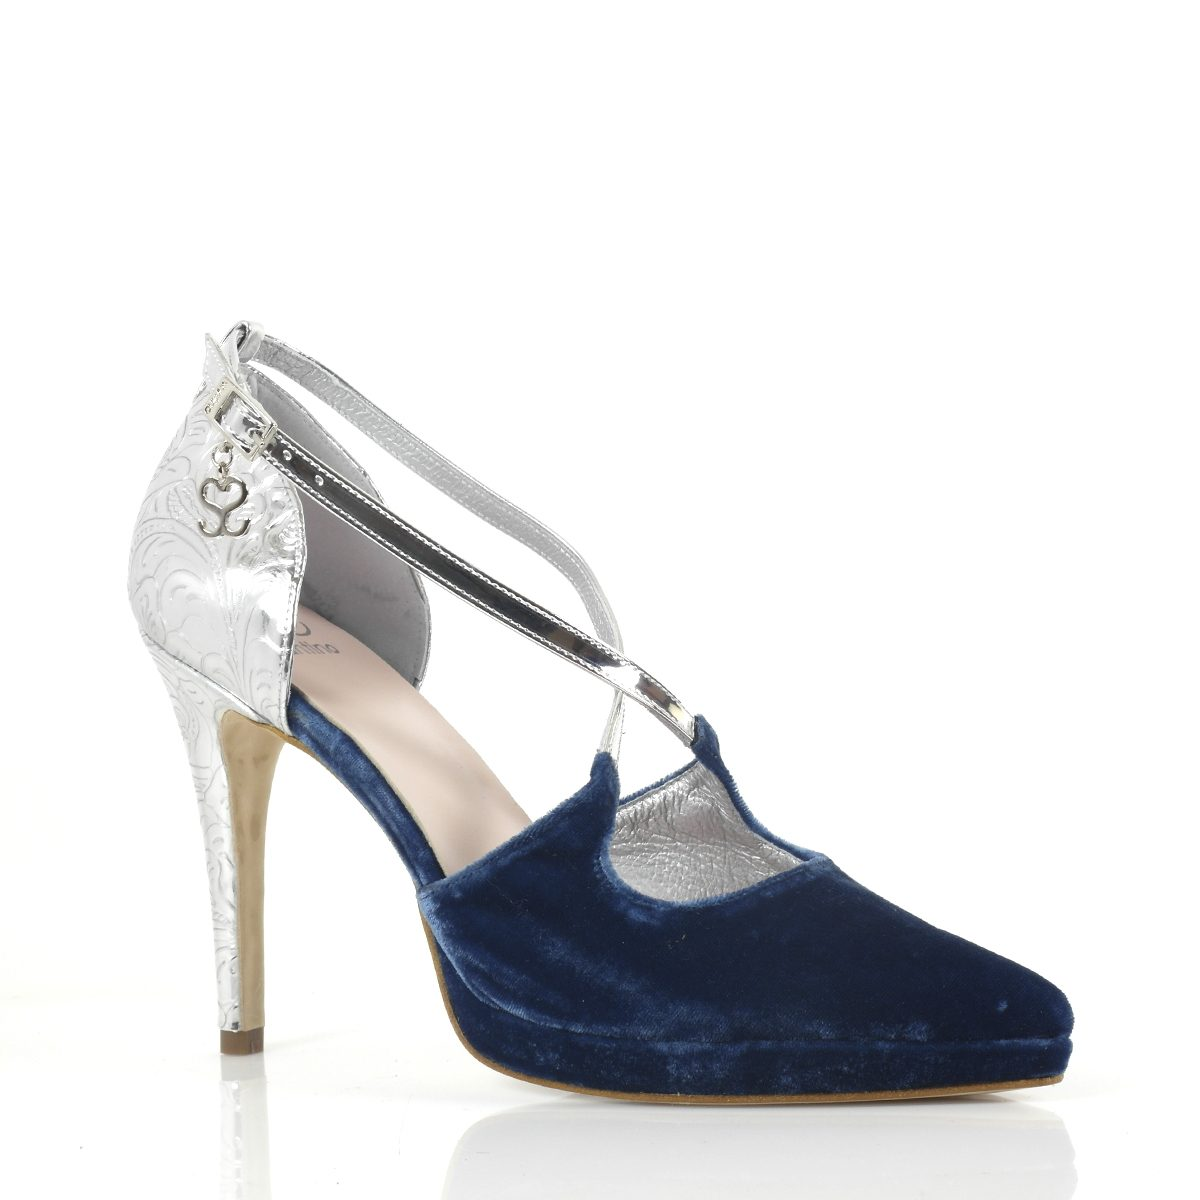 SALON MOD.9887 (11cm) - Zapatos Personalizados Fiesta